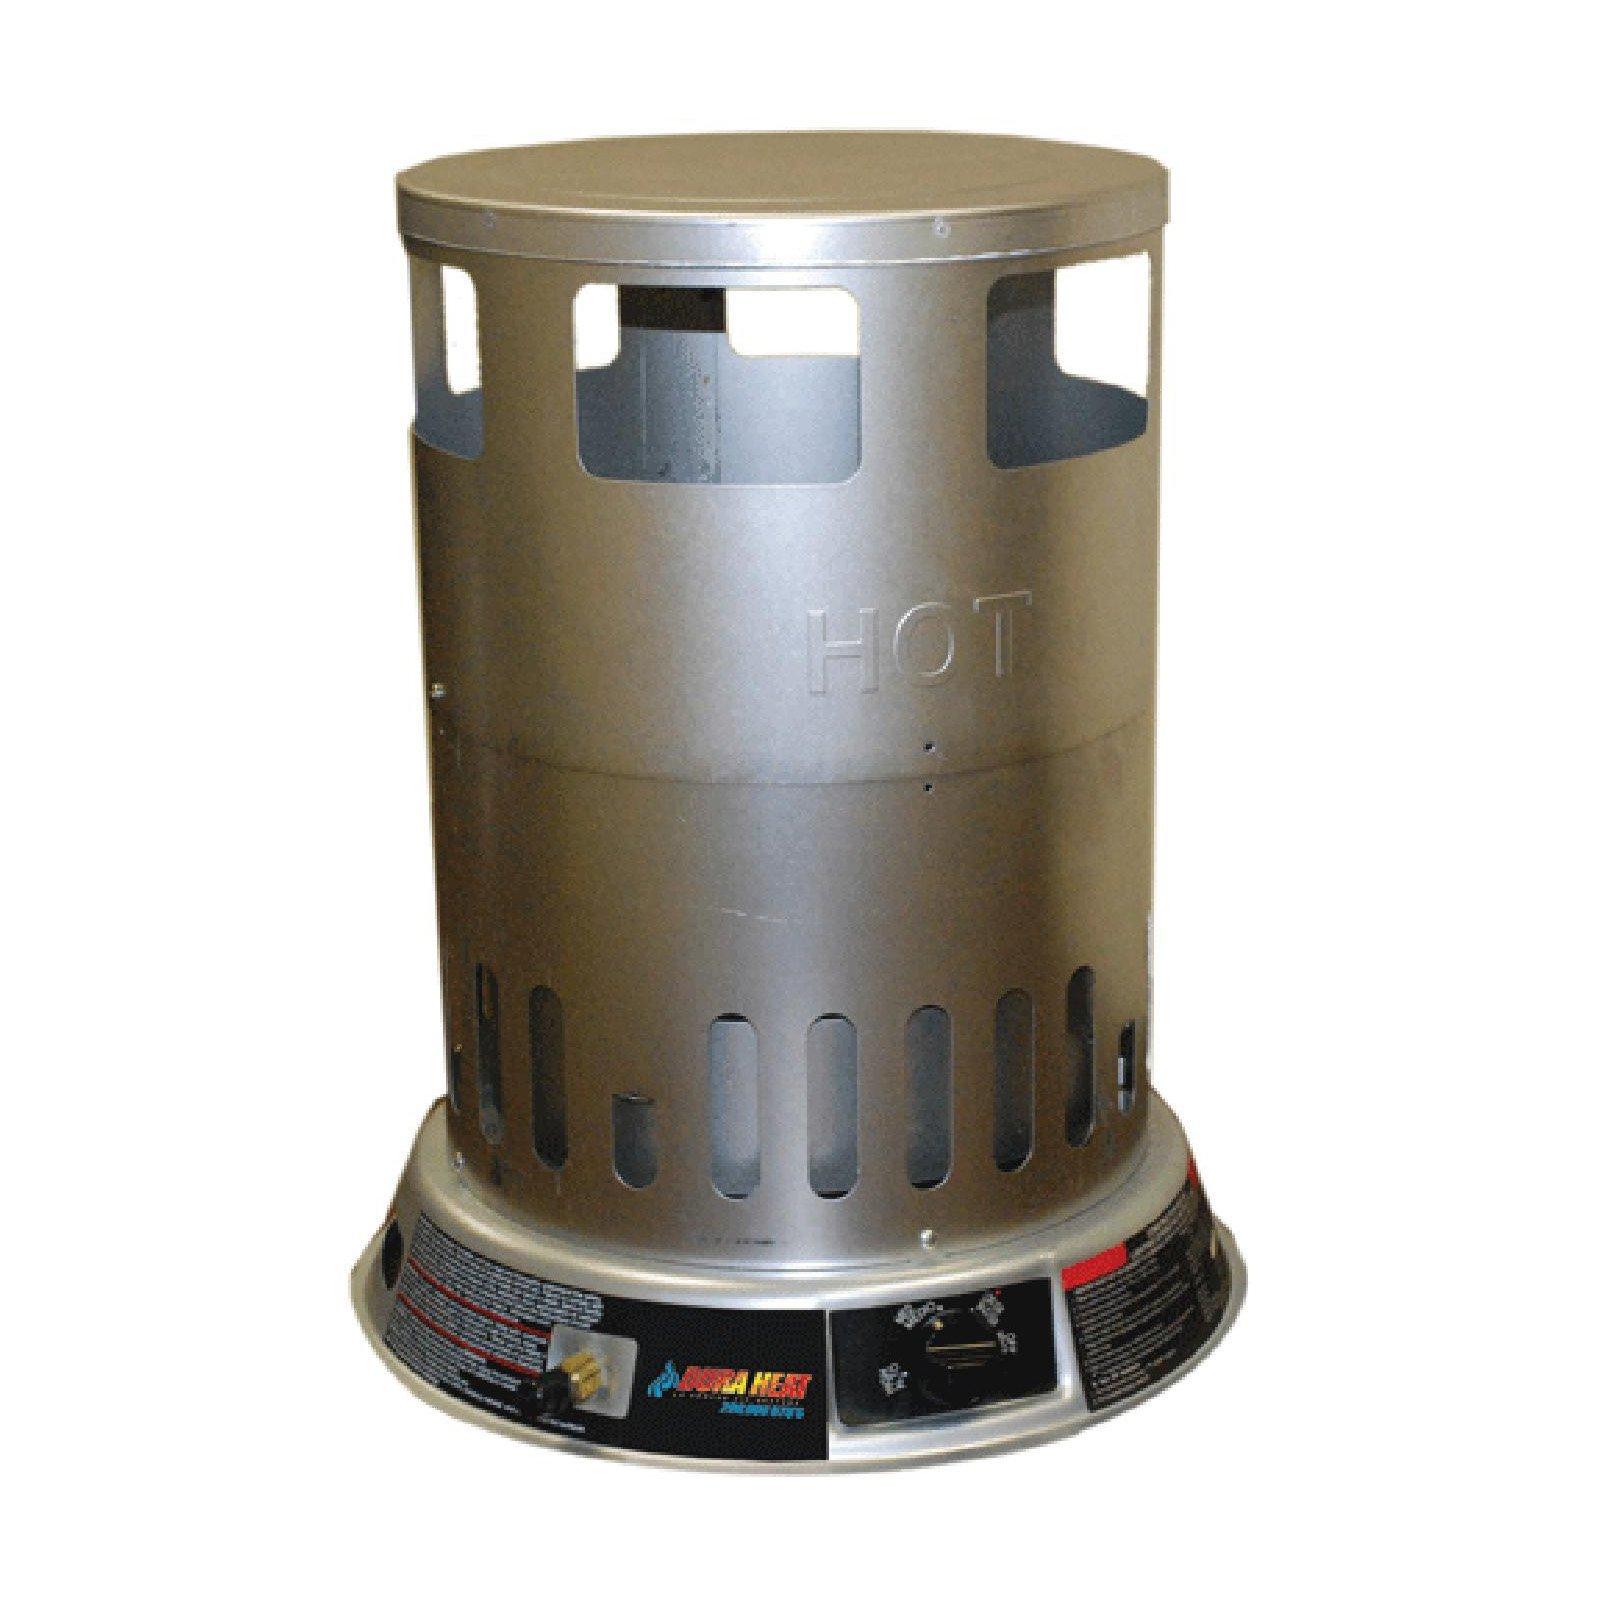 Propane Convection Heater Portable Garage Indoor Shop Warm ...